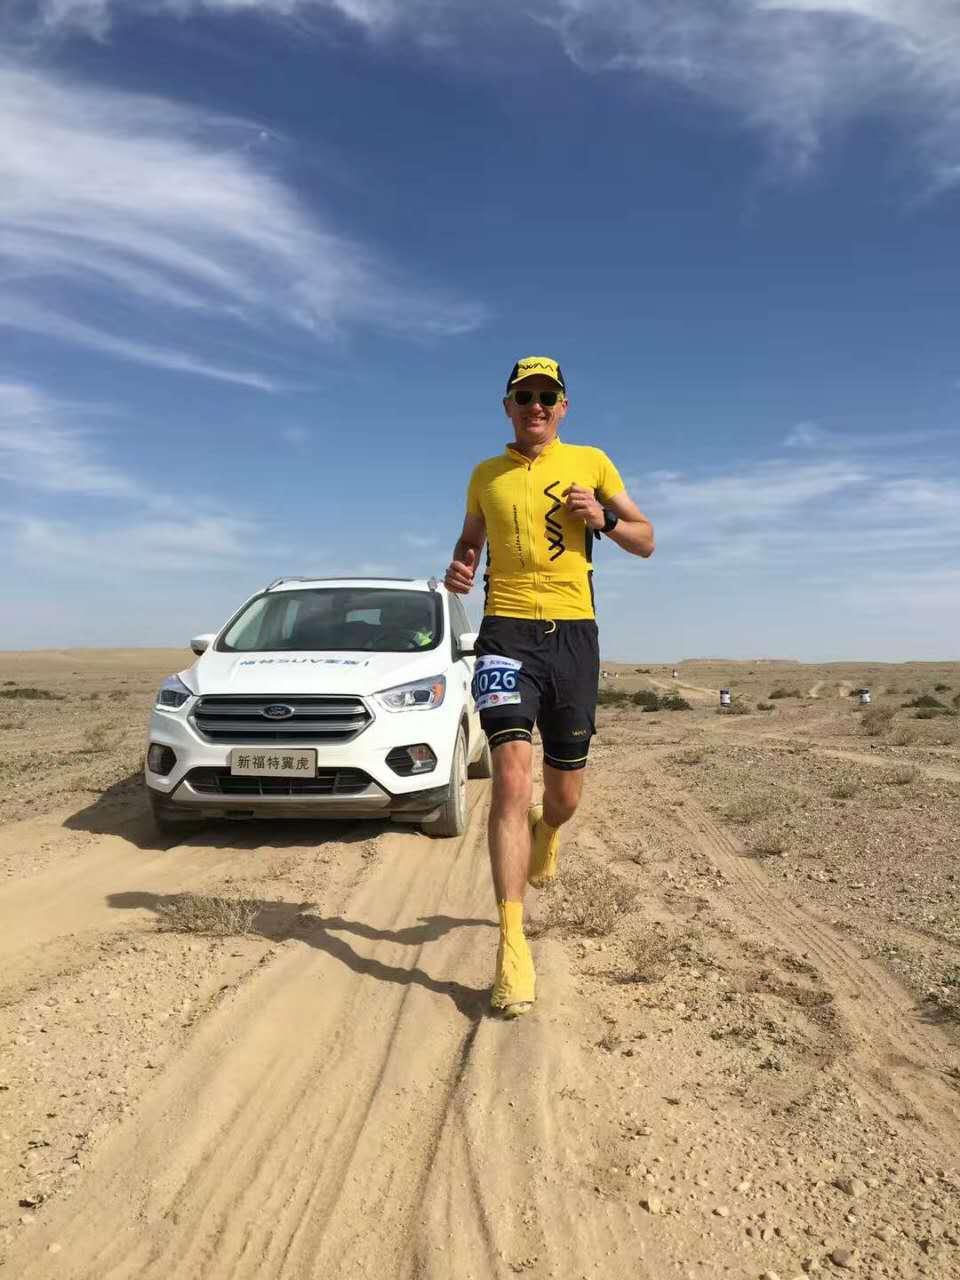 Dion Leonard, China, Changan Ford, Gobi 100km 2016